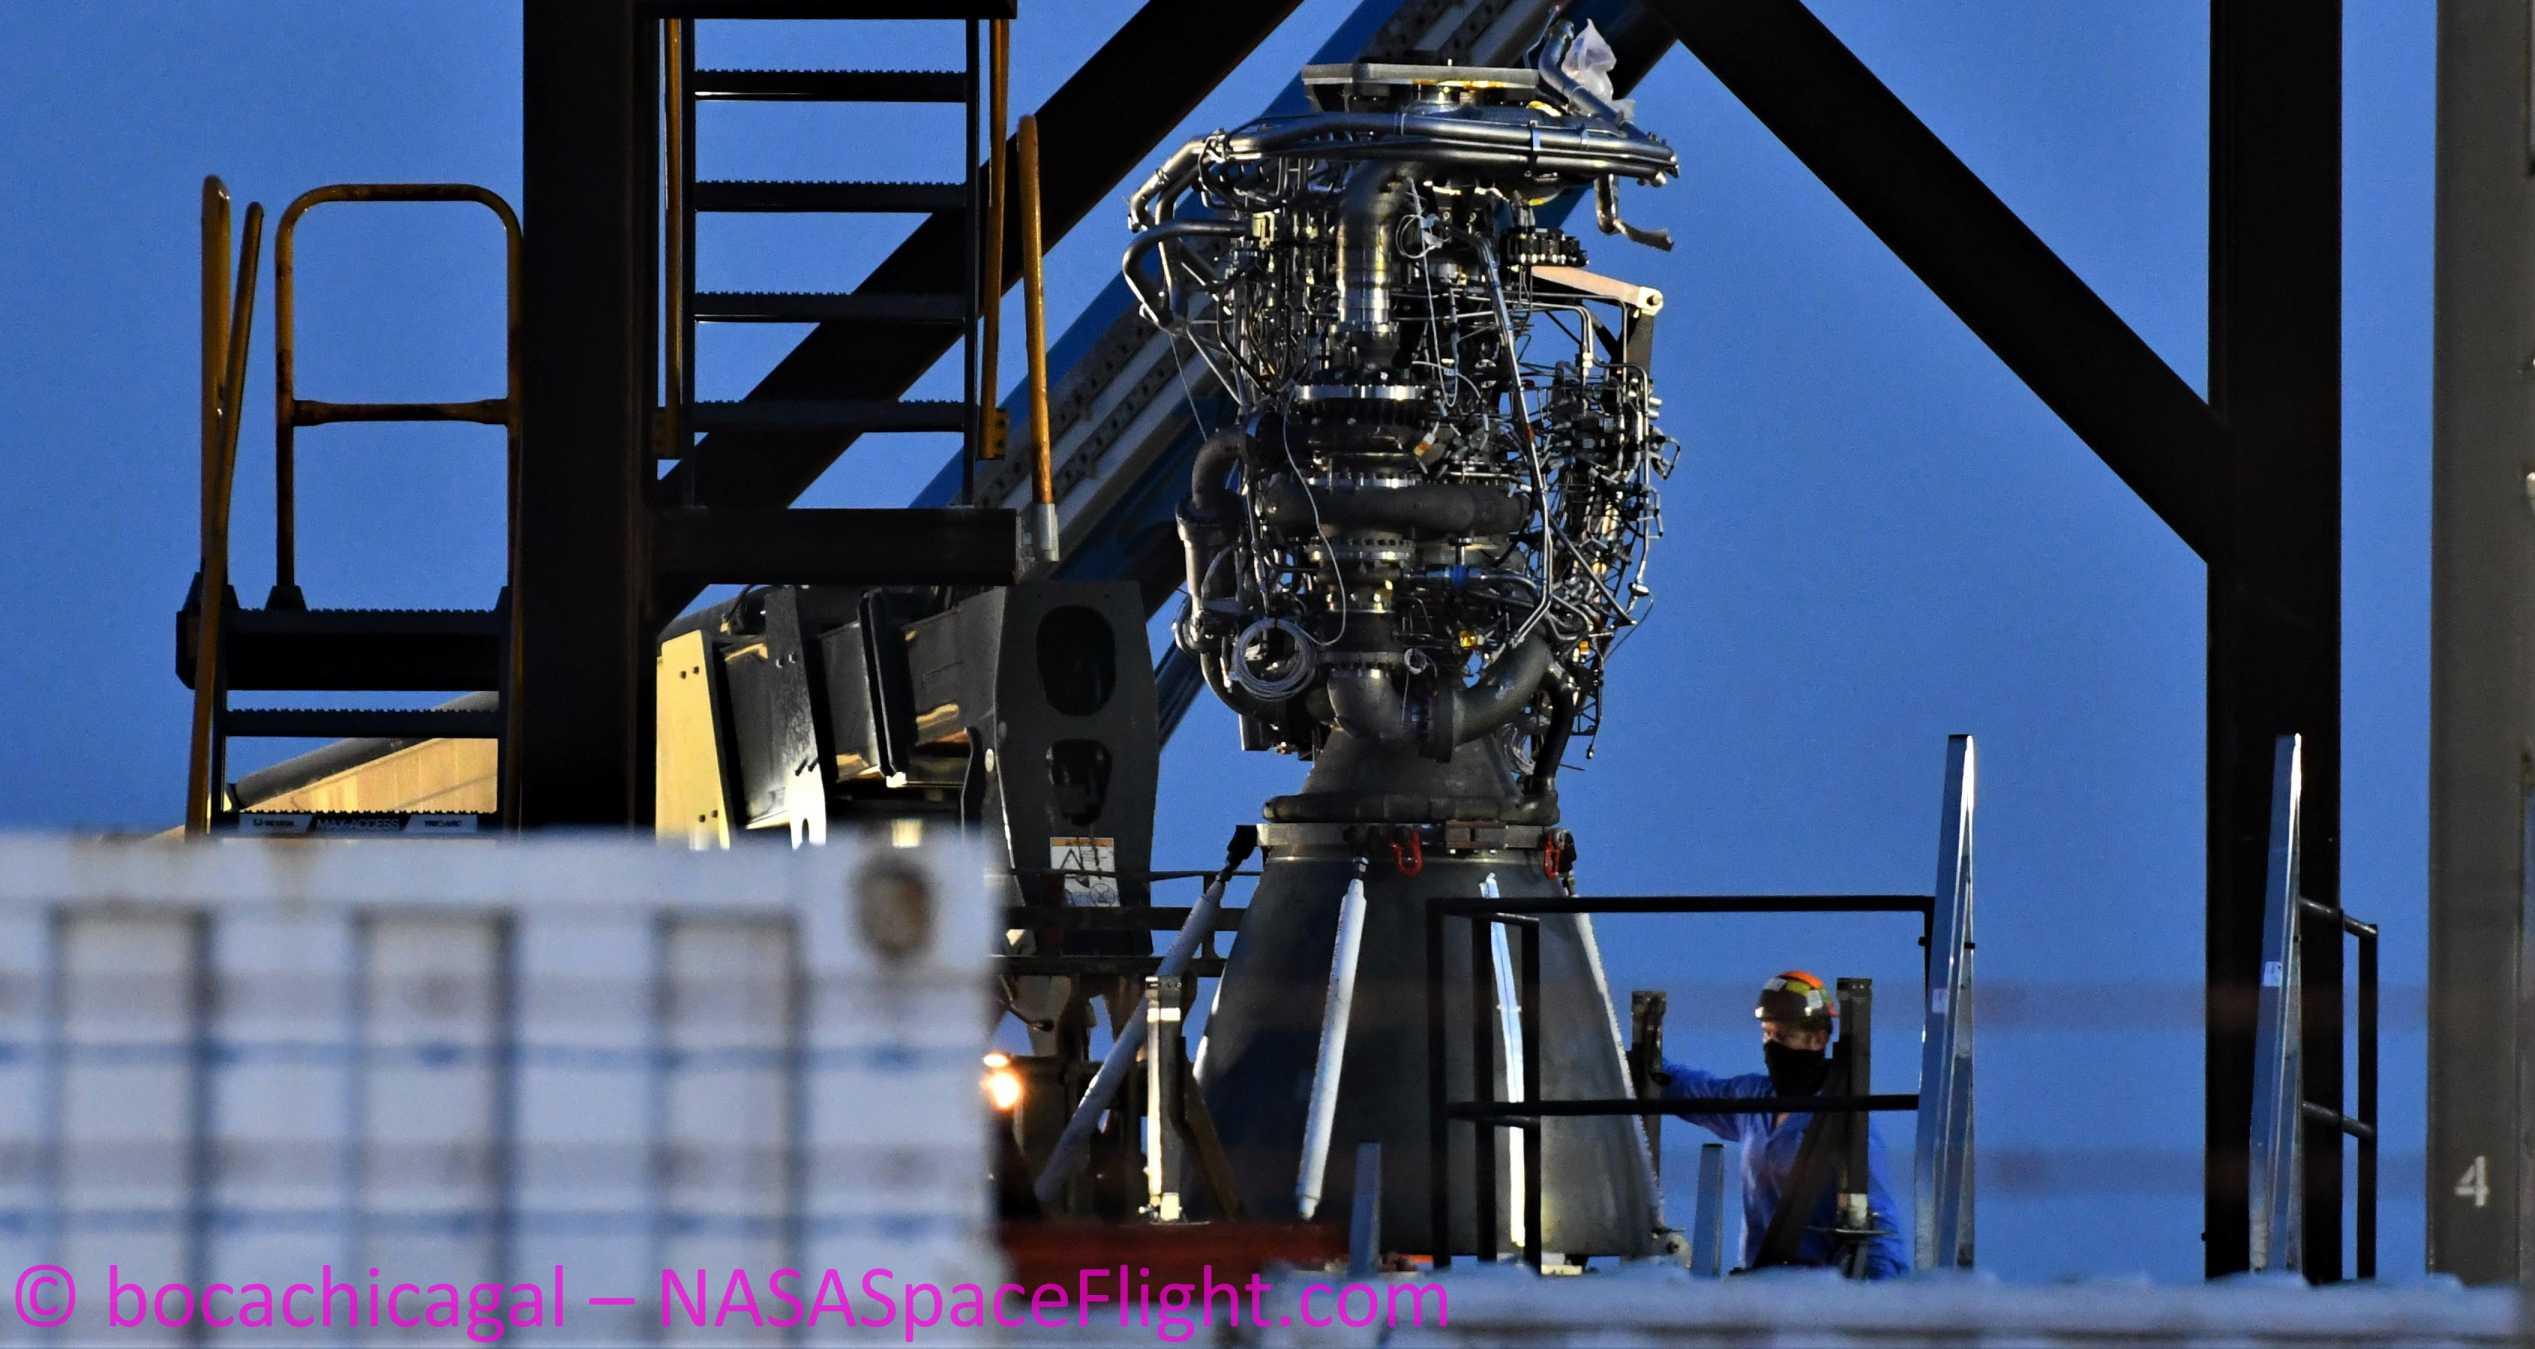 Starship Boca Chica 070320 (NASASpaceflight – bocachicagal) SN5 Raptor SN27 pad arrival 1 crop (c)